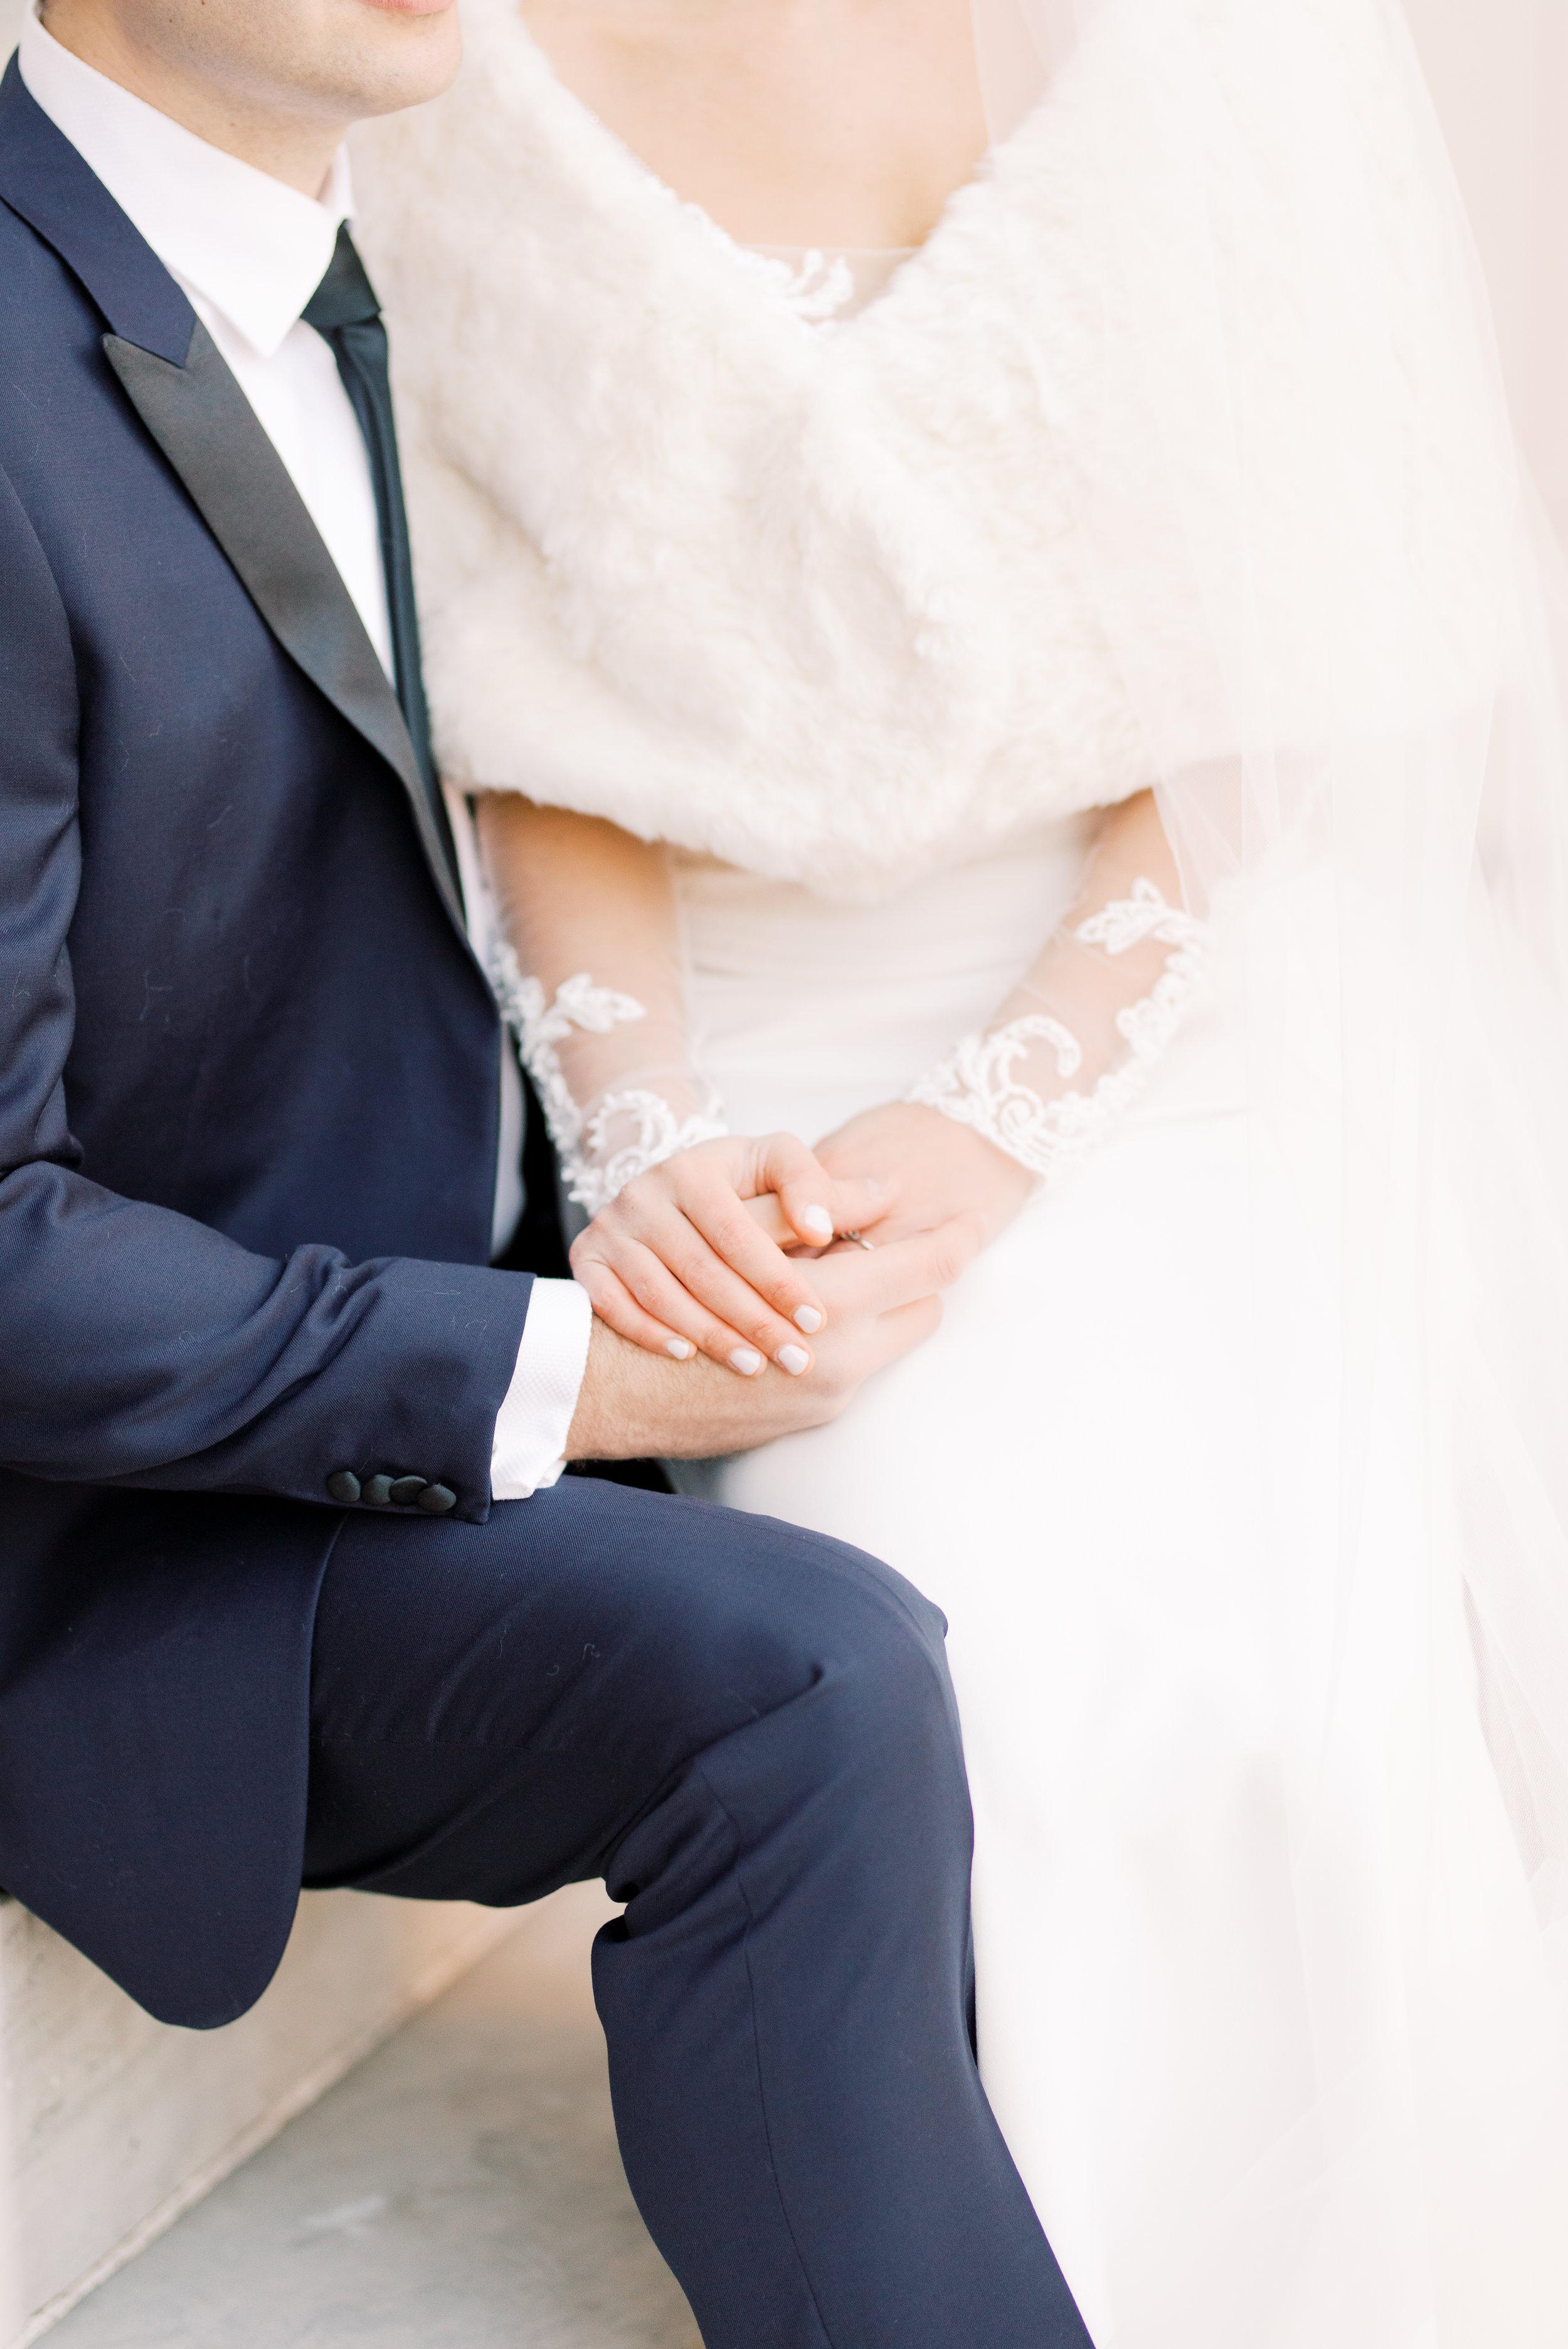 haley-richter-photography-classic-winter-union-trust-philadelphia-wedding-072.jpg